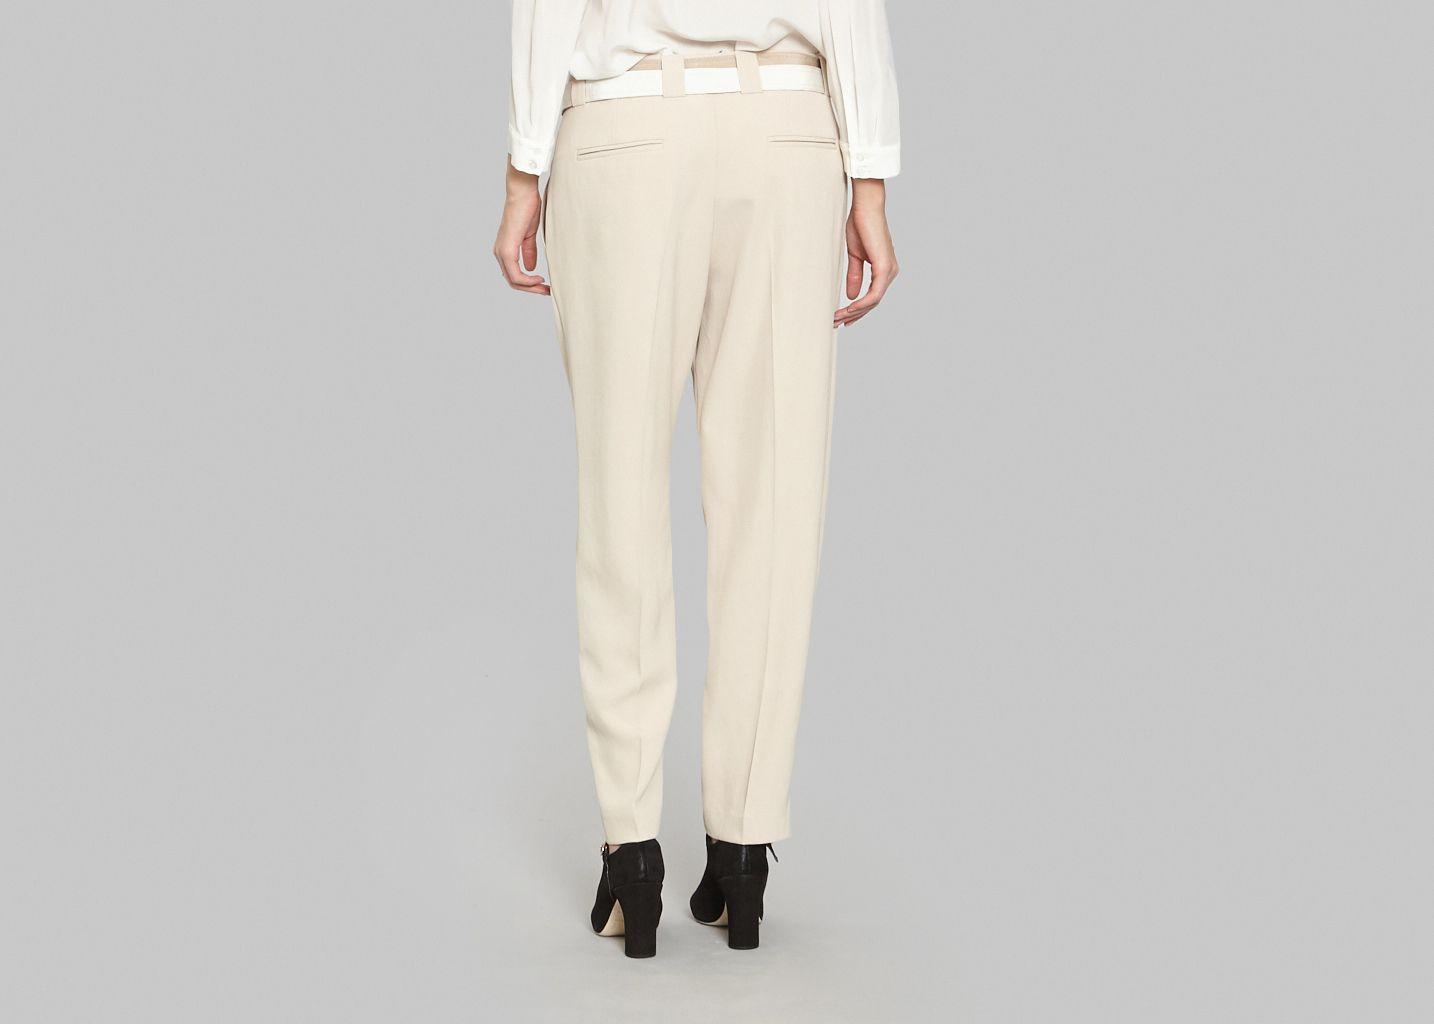 Pantalon La Working Girl - Tara Jarmon